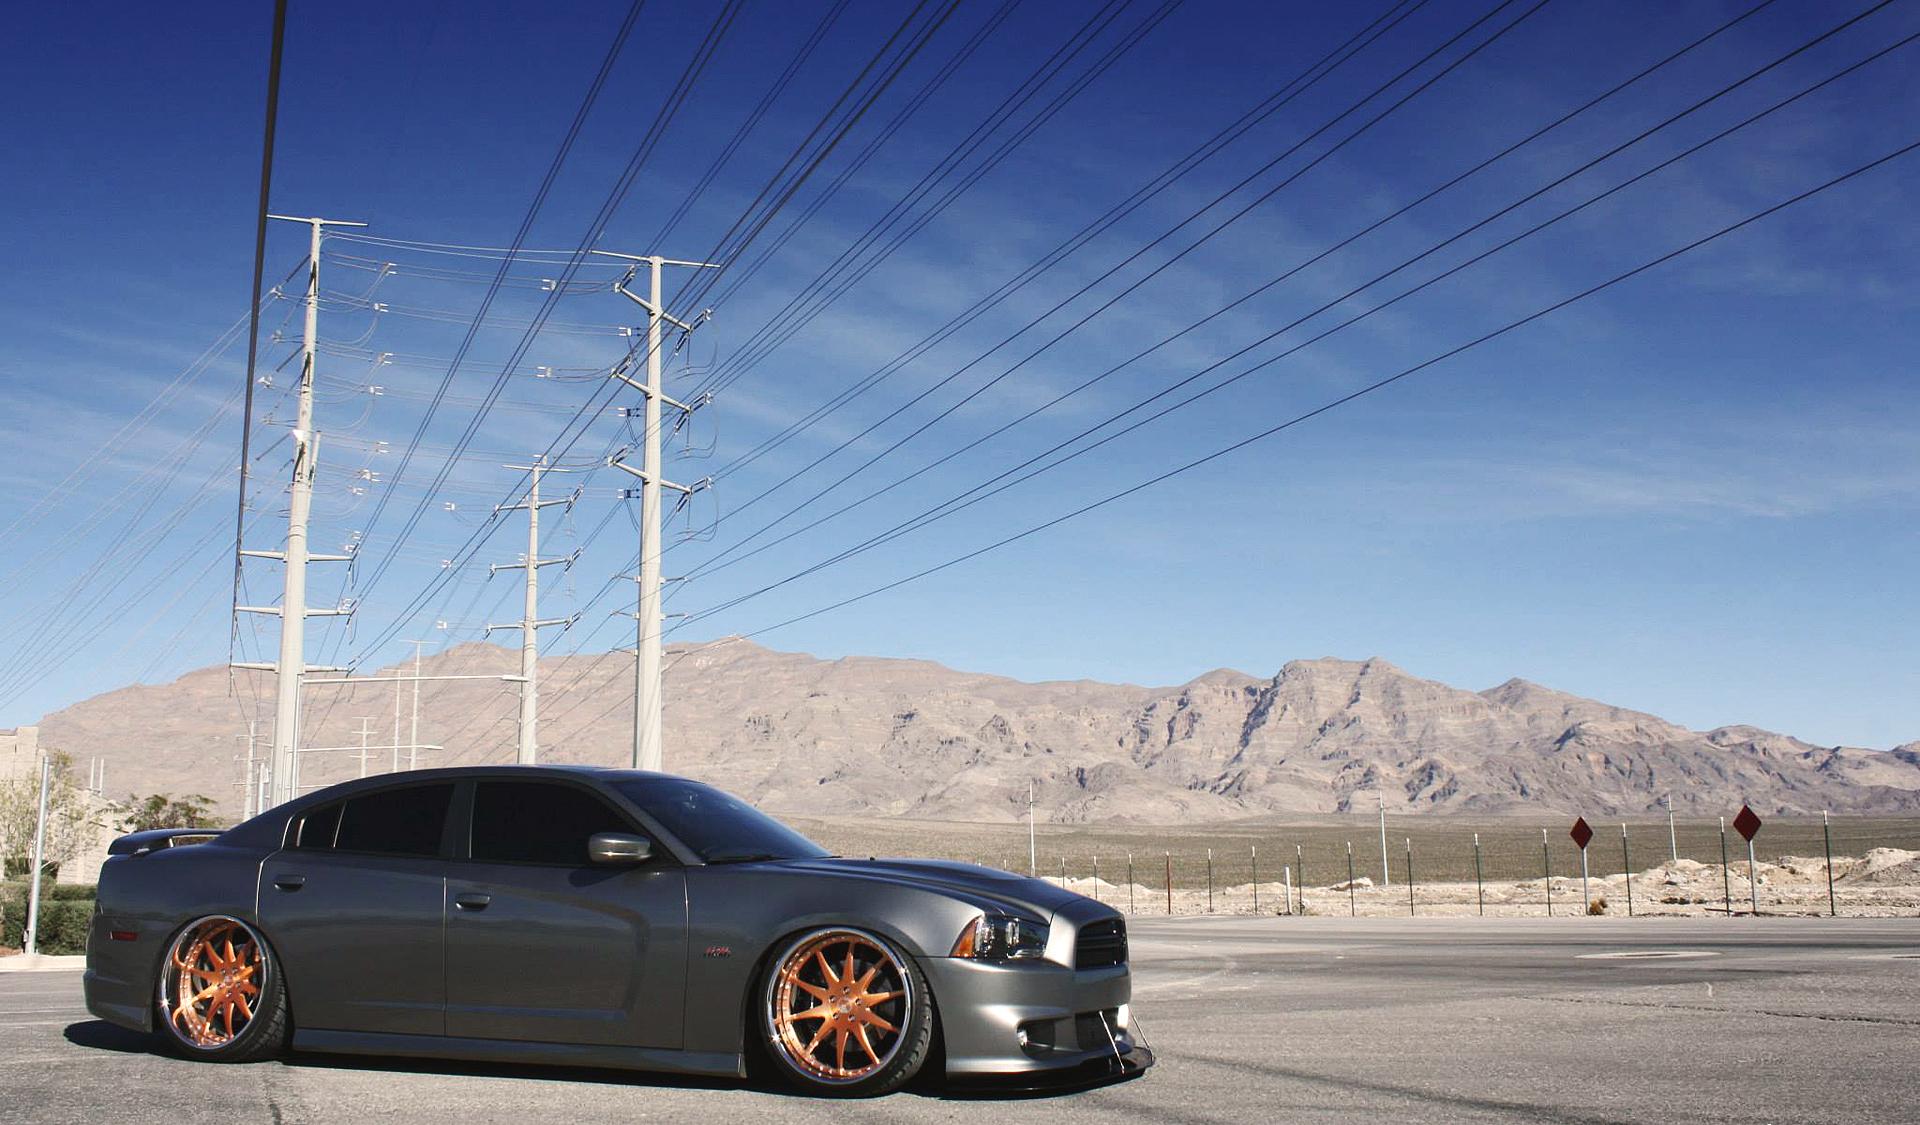 Dodge charger srt8  № 3813495 бесплатно